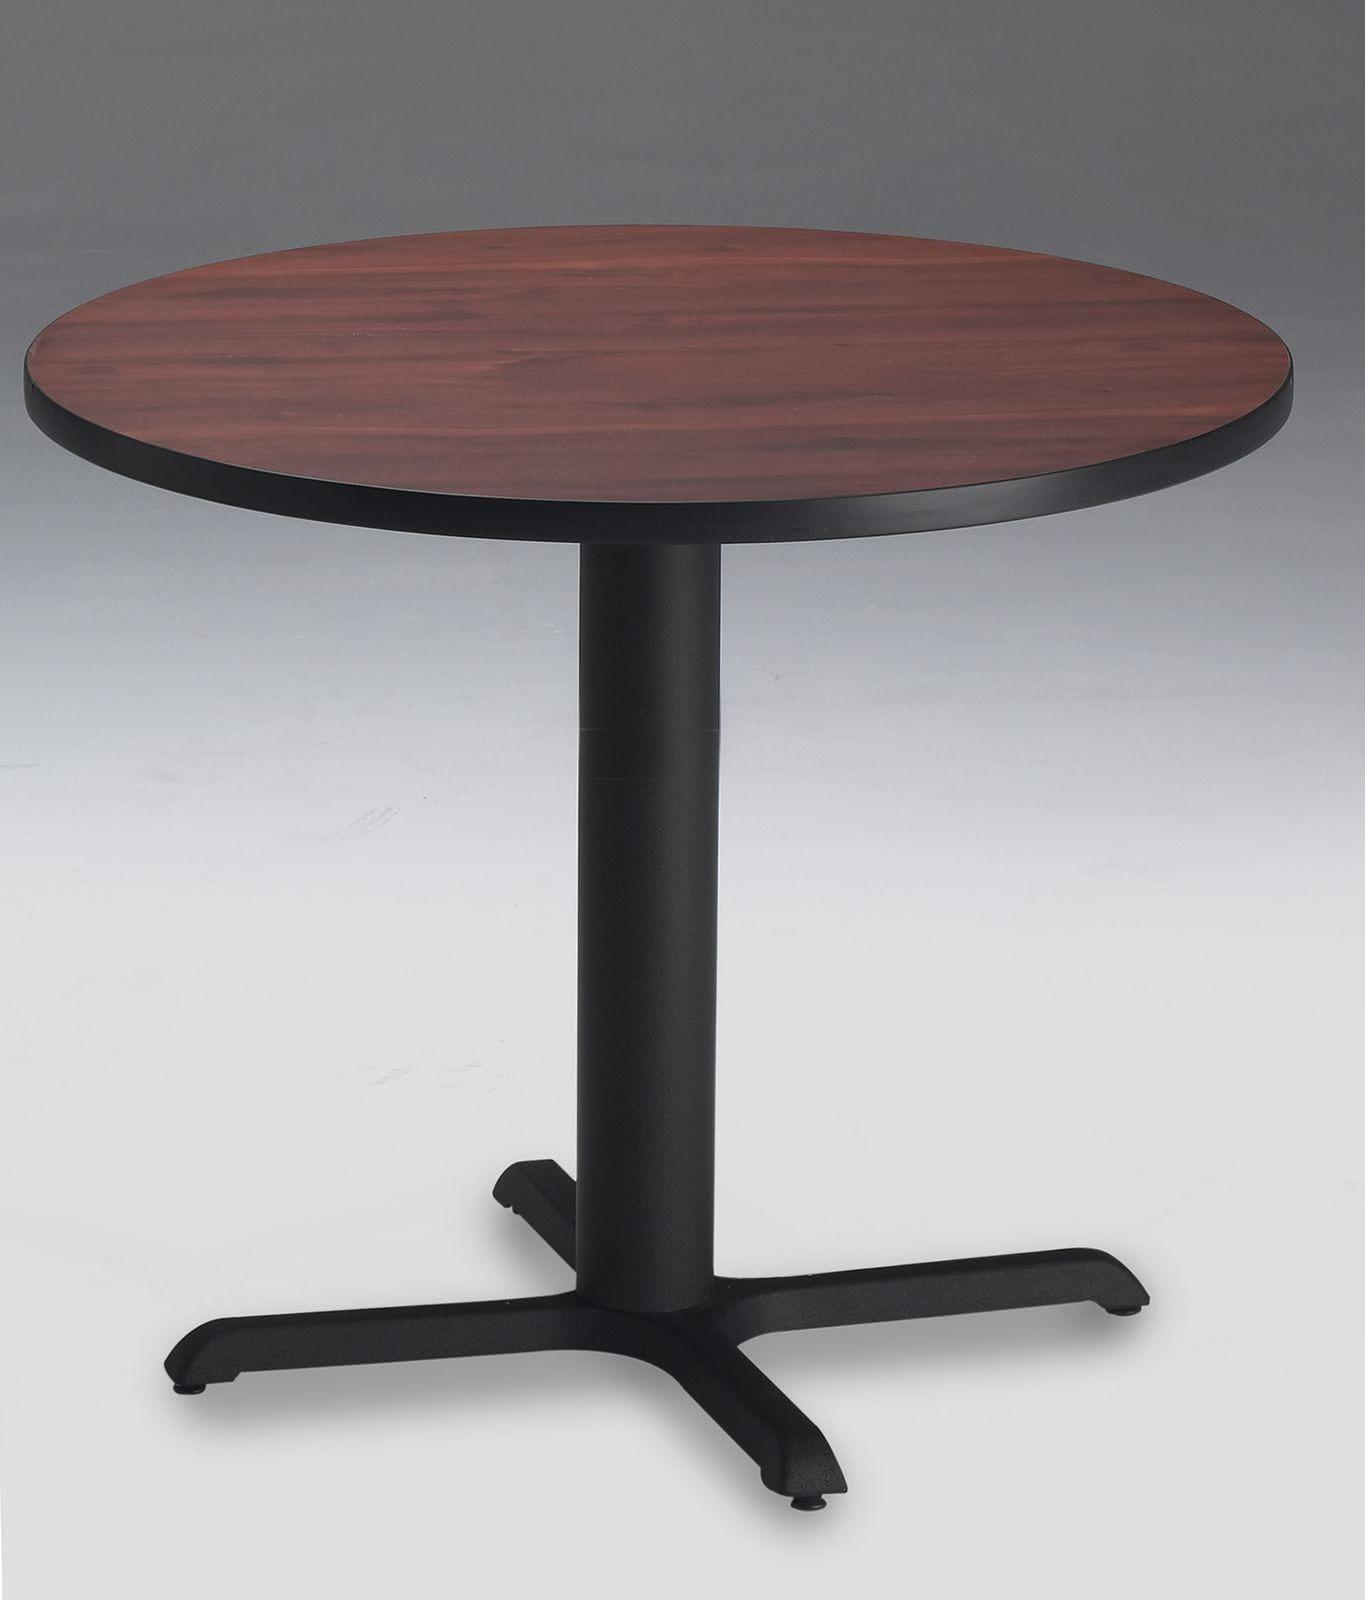 30 Inch Round Kitchen Table: Mayline Bistro Dining-height 30 Inch Round Table